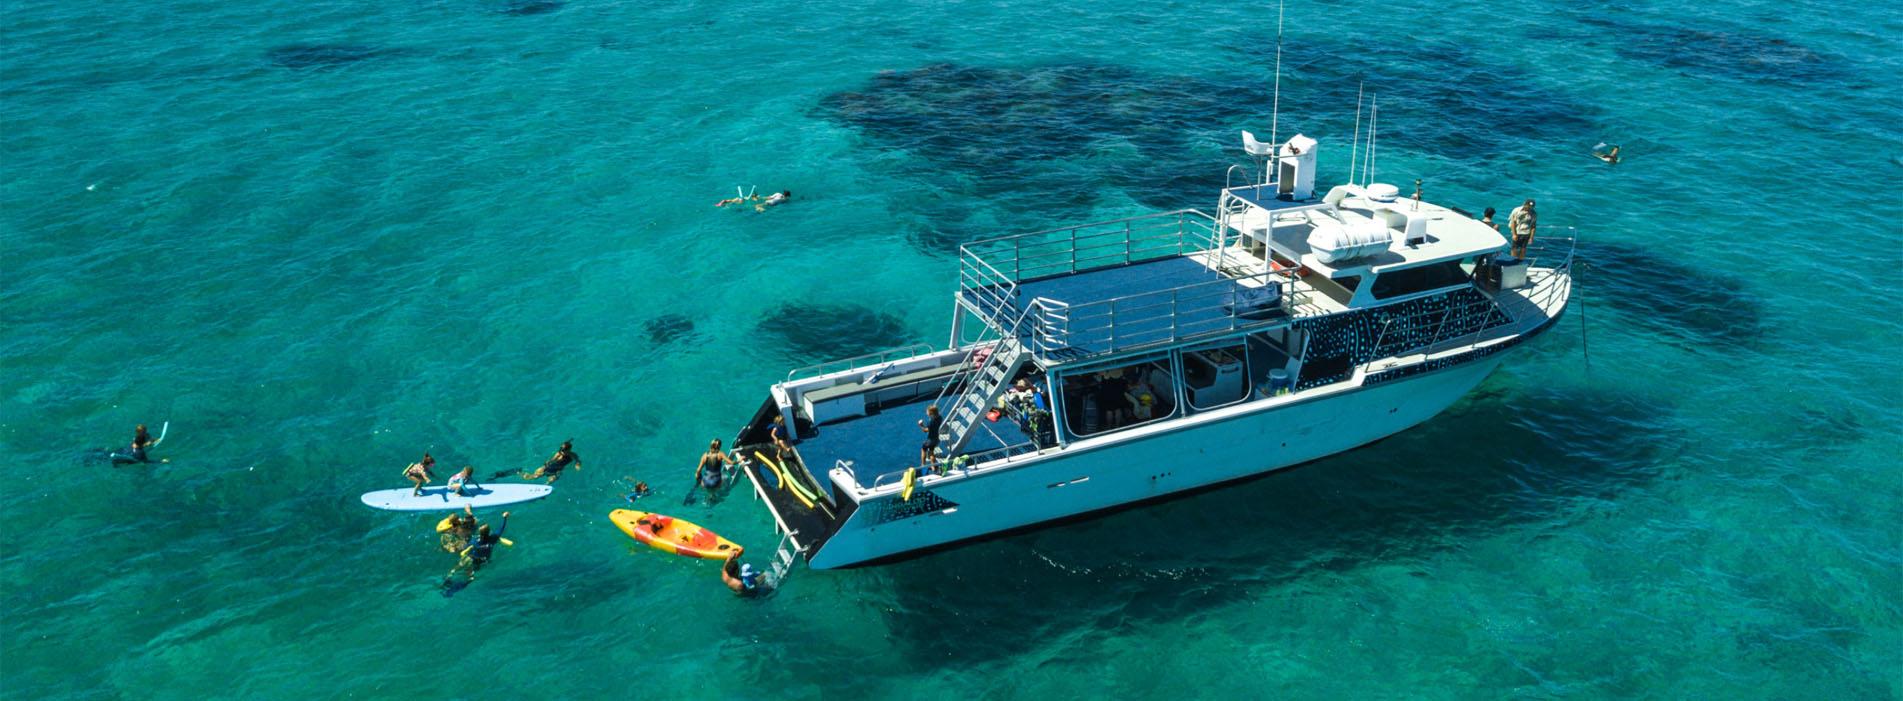 INVESTIGATOR Exmouth Ningaloo Reef Whale swim aerial photo